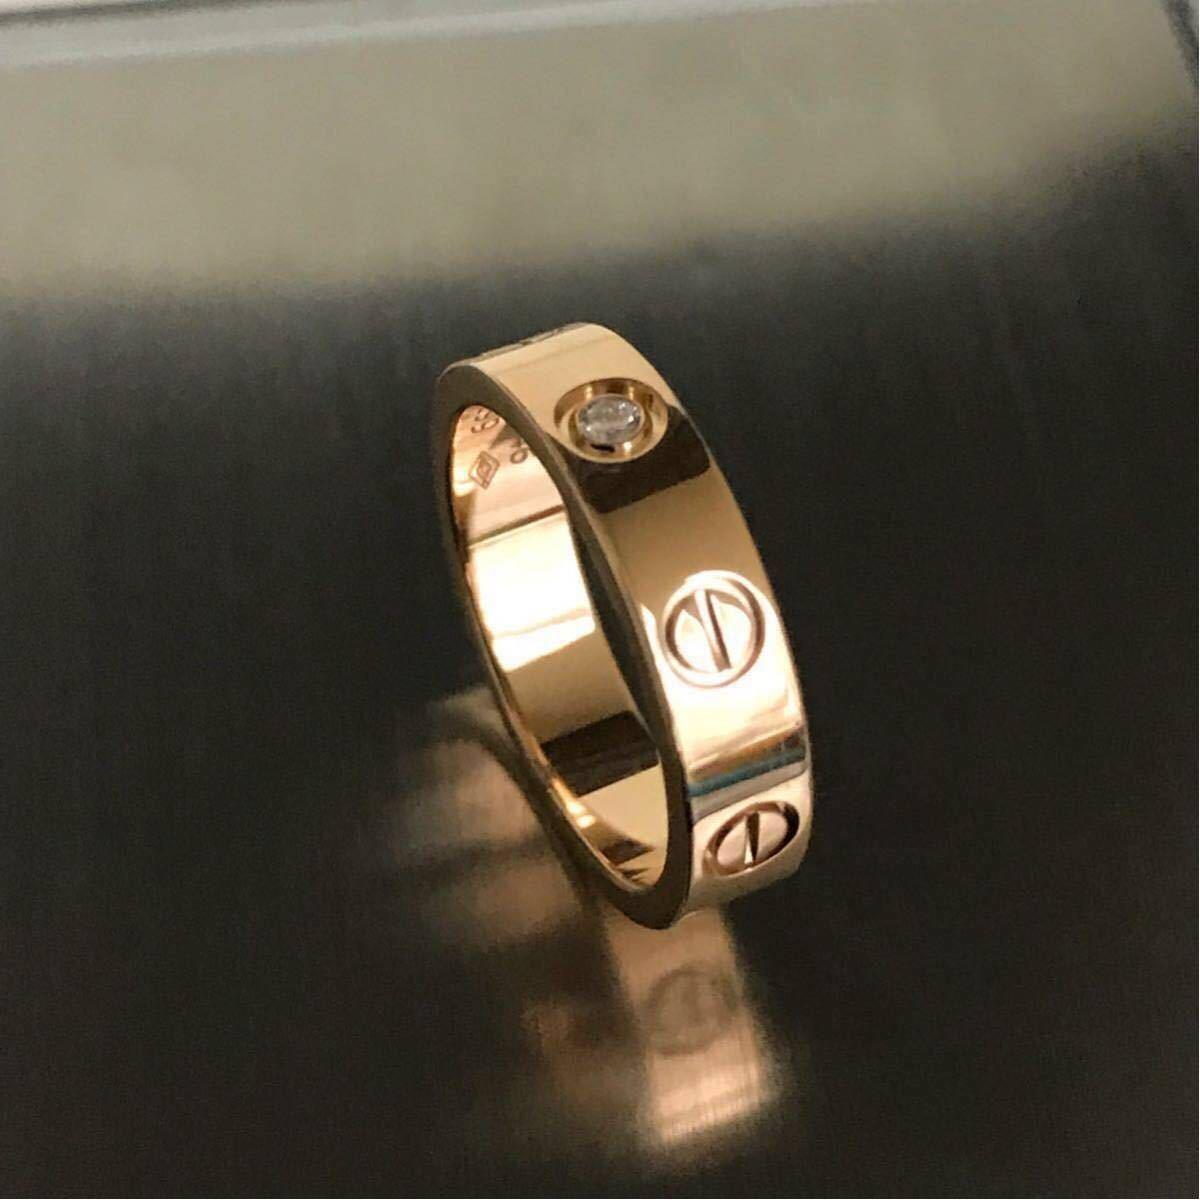 Cartier★カルティエ ラブリング★K18PG 1p ダイヤモンドリング 46 指輪 ウエディング ピンクゴールド_画像2